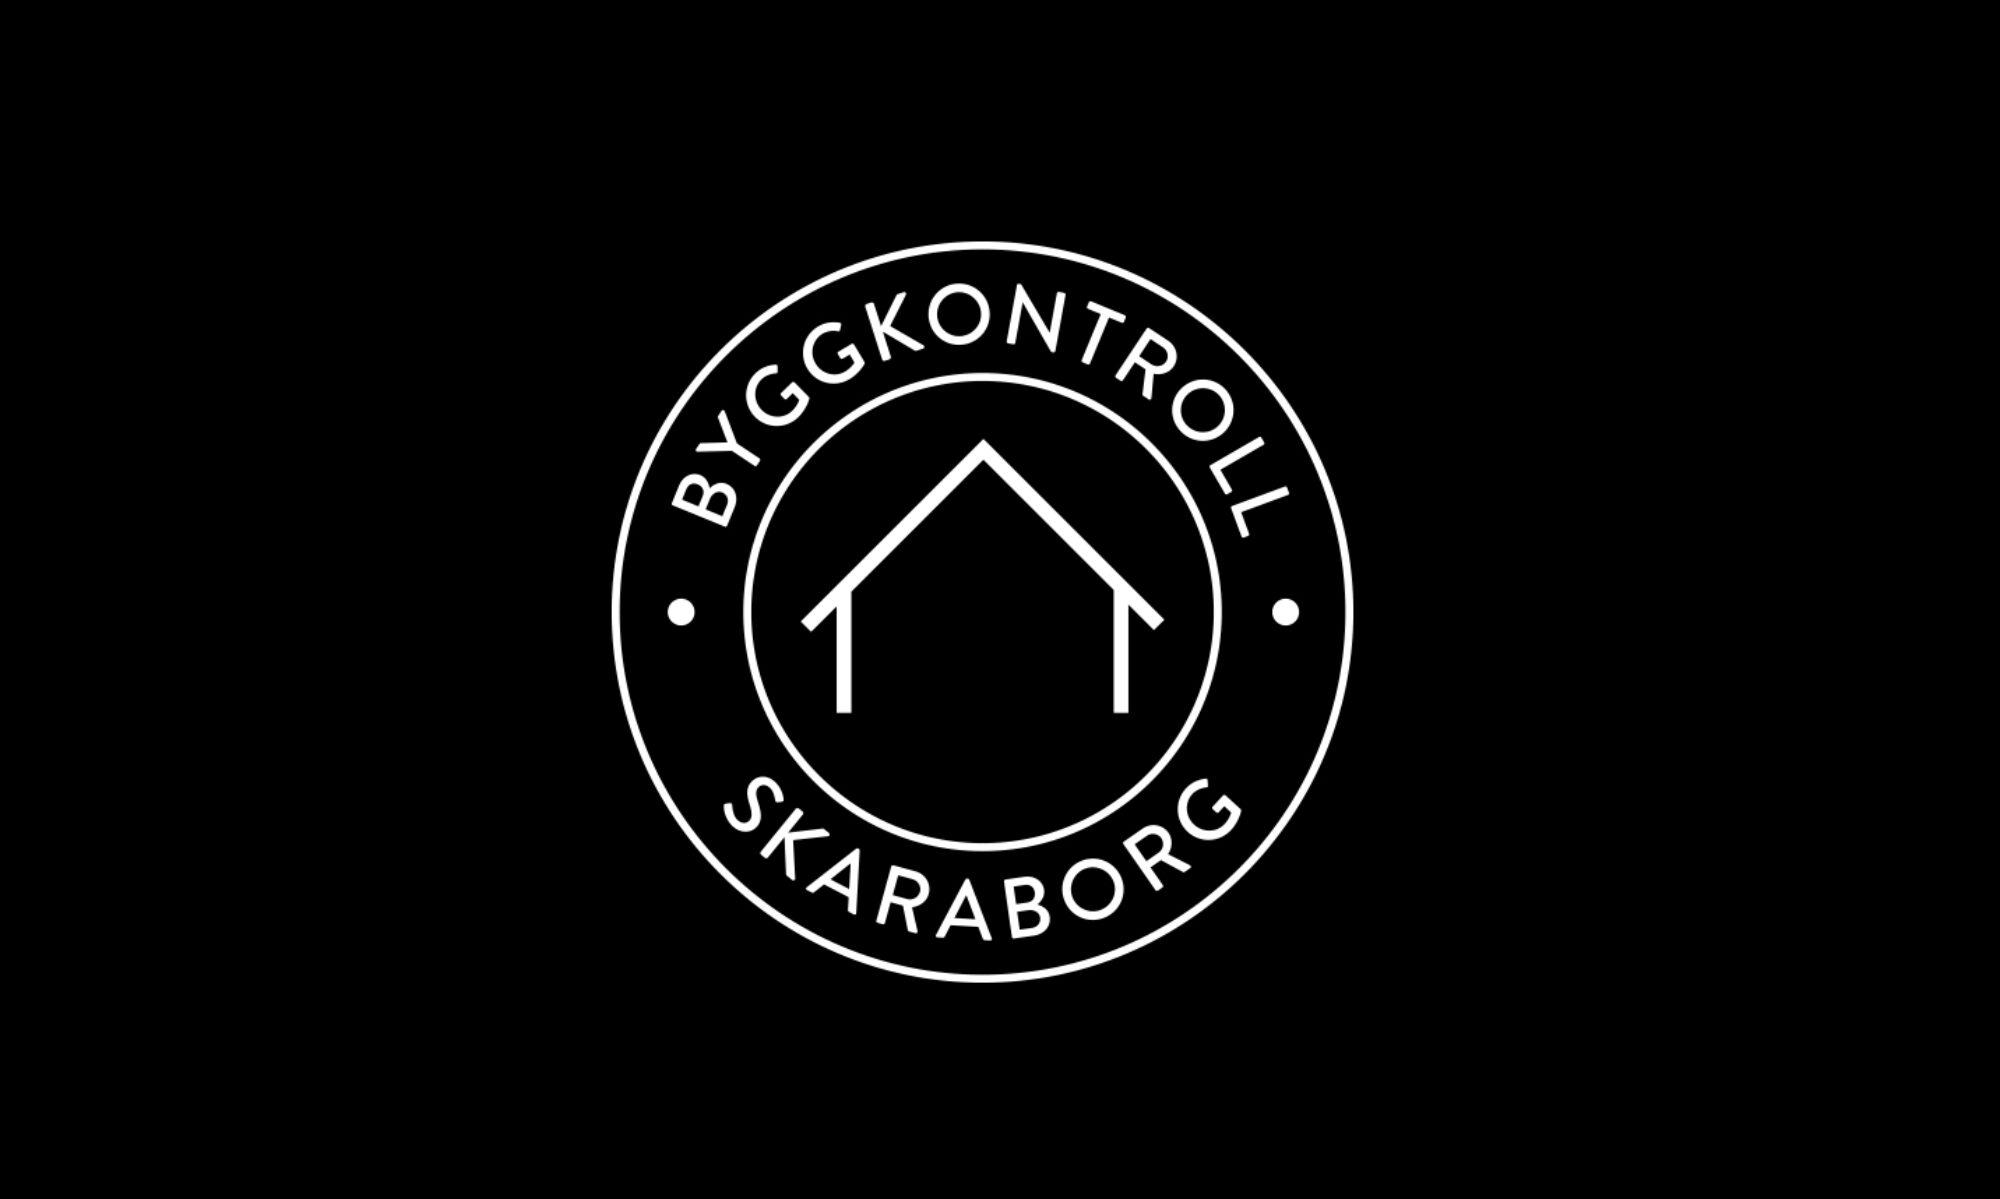 Byggkontroll Skaraborg